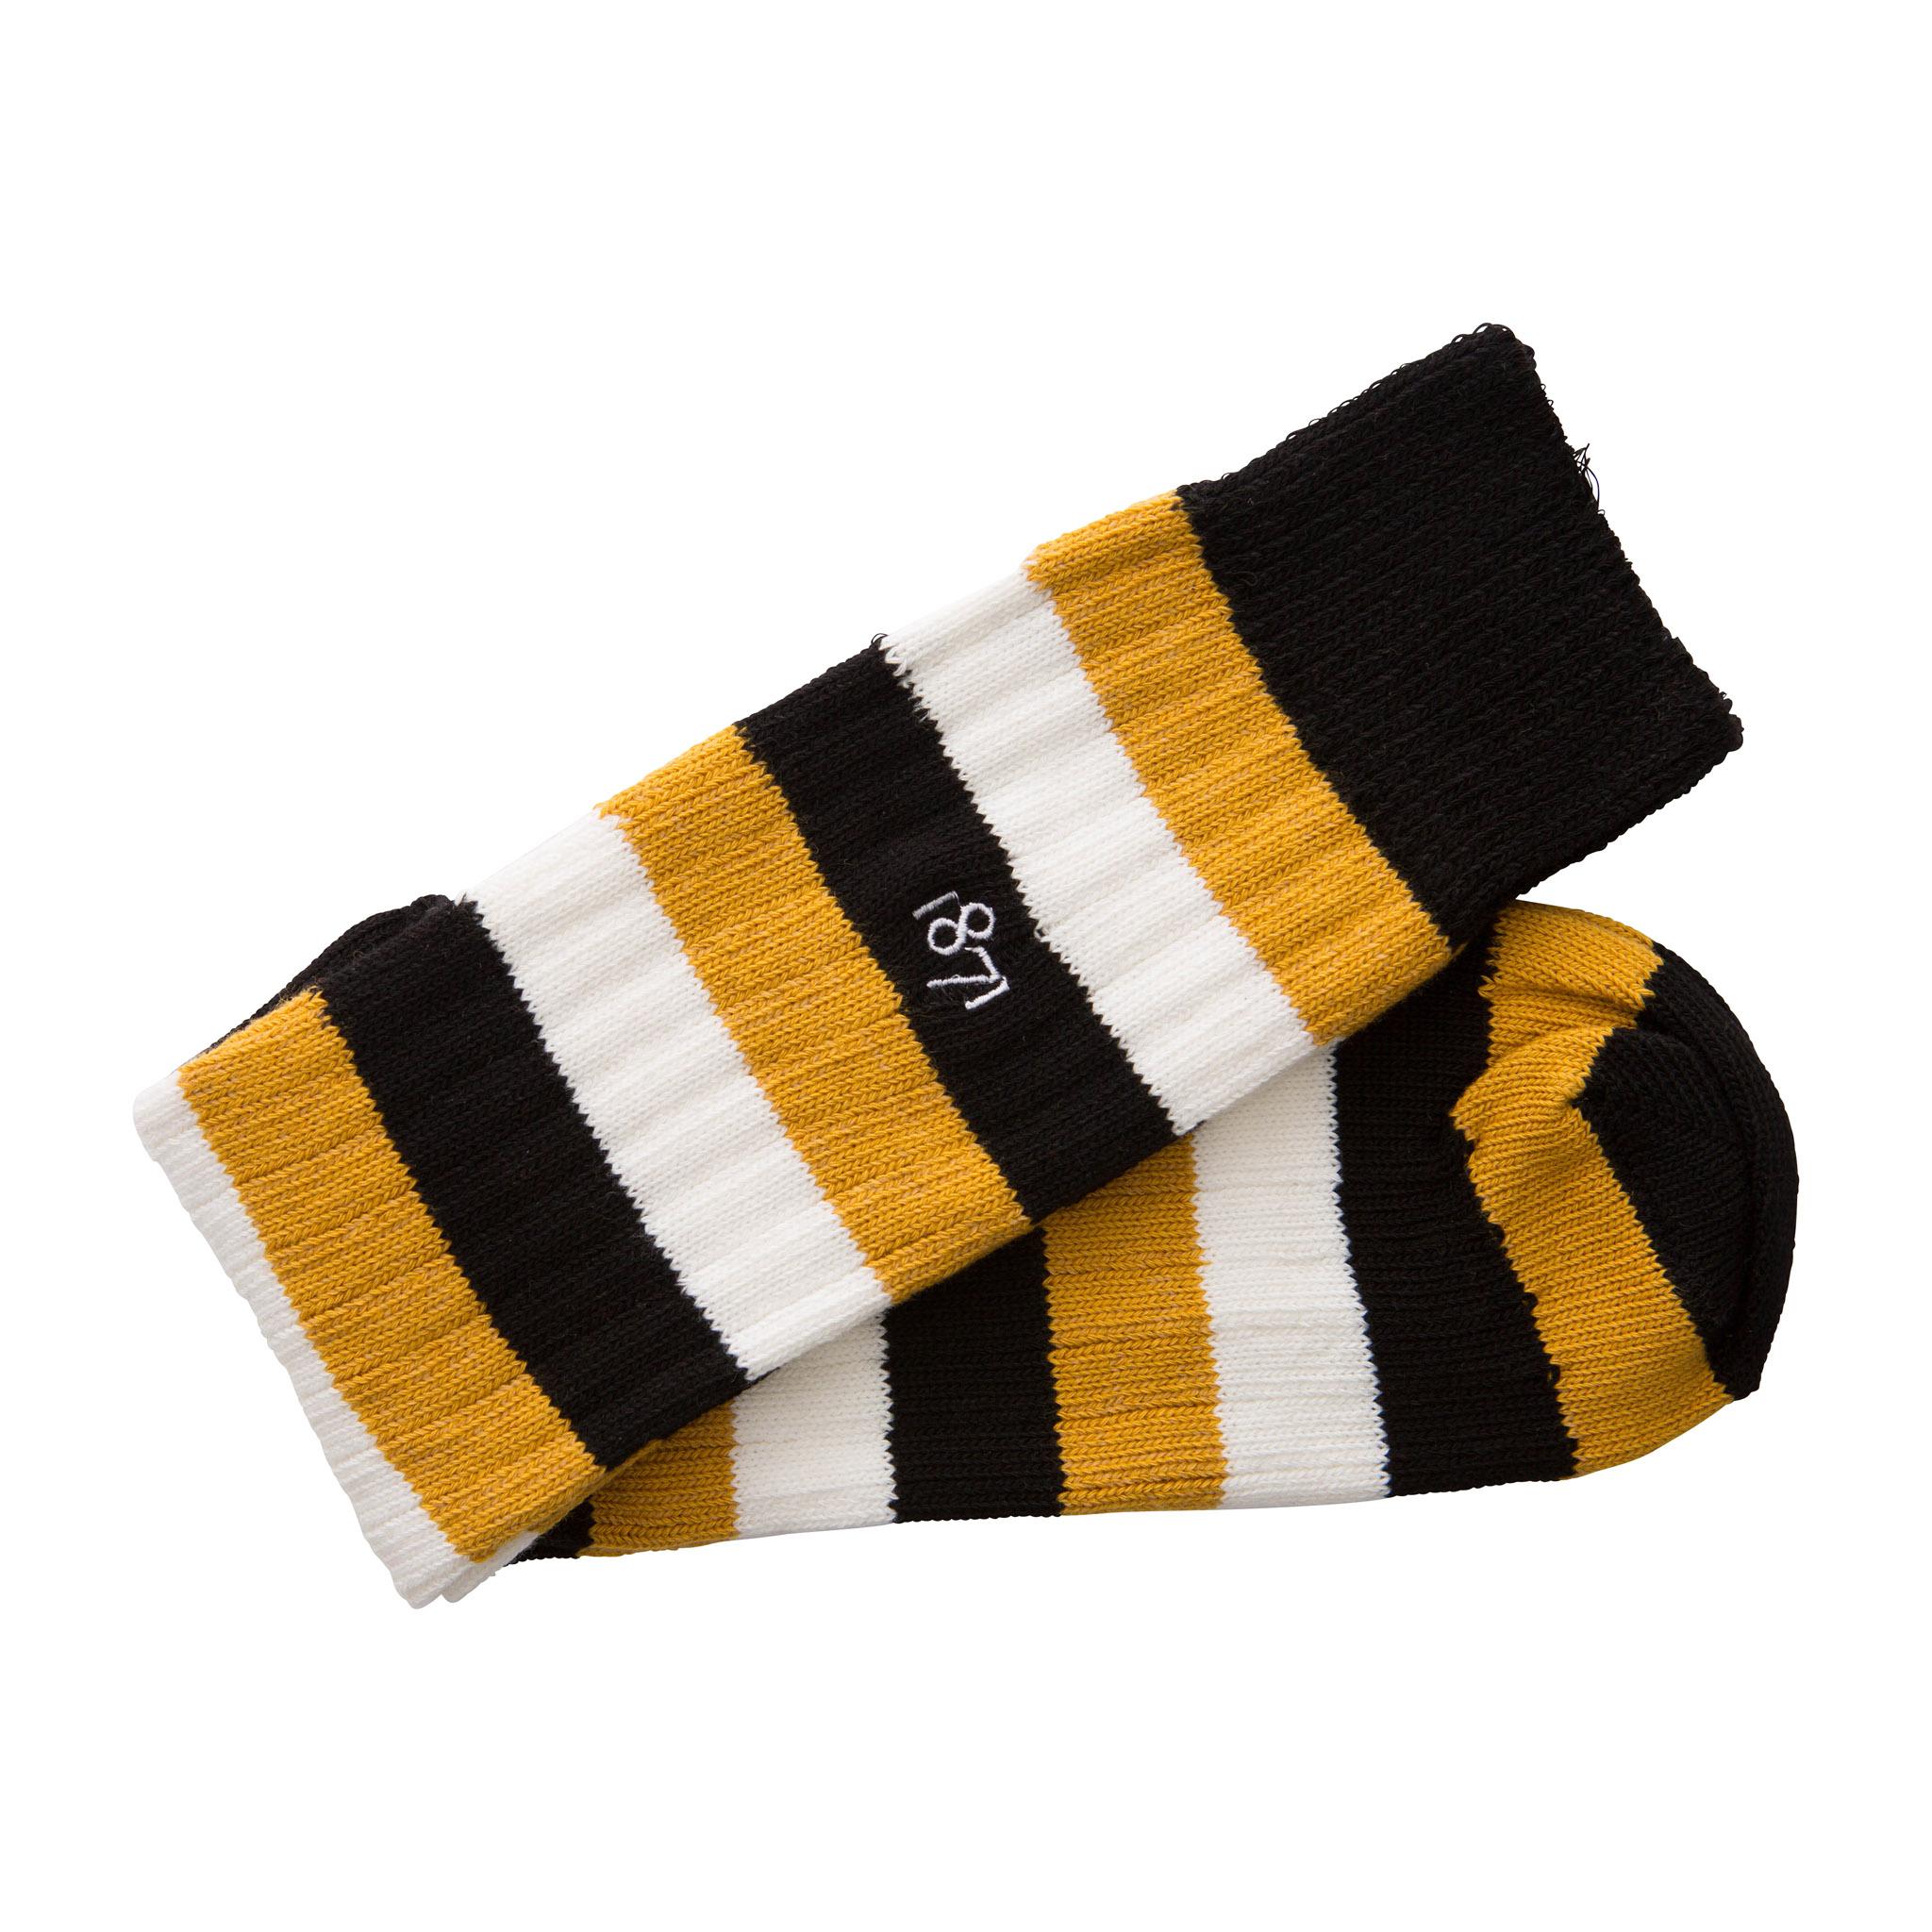 Cotton black, yellow and white stripe sock - folded